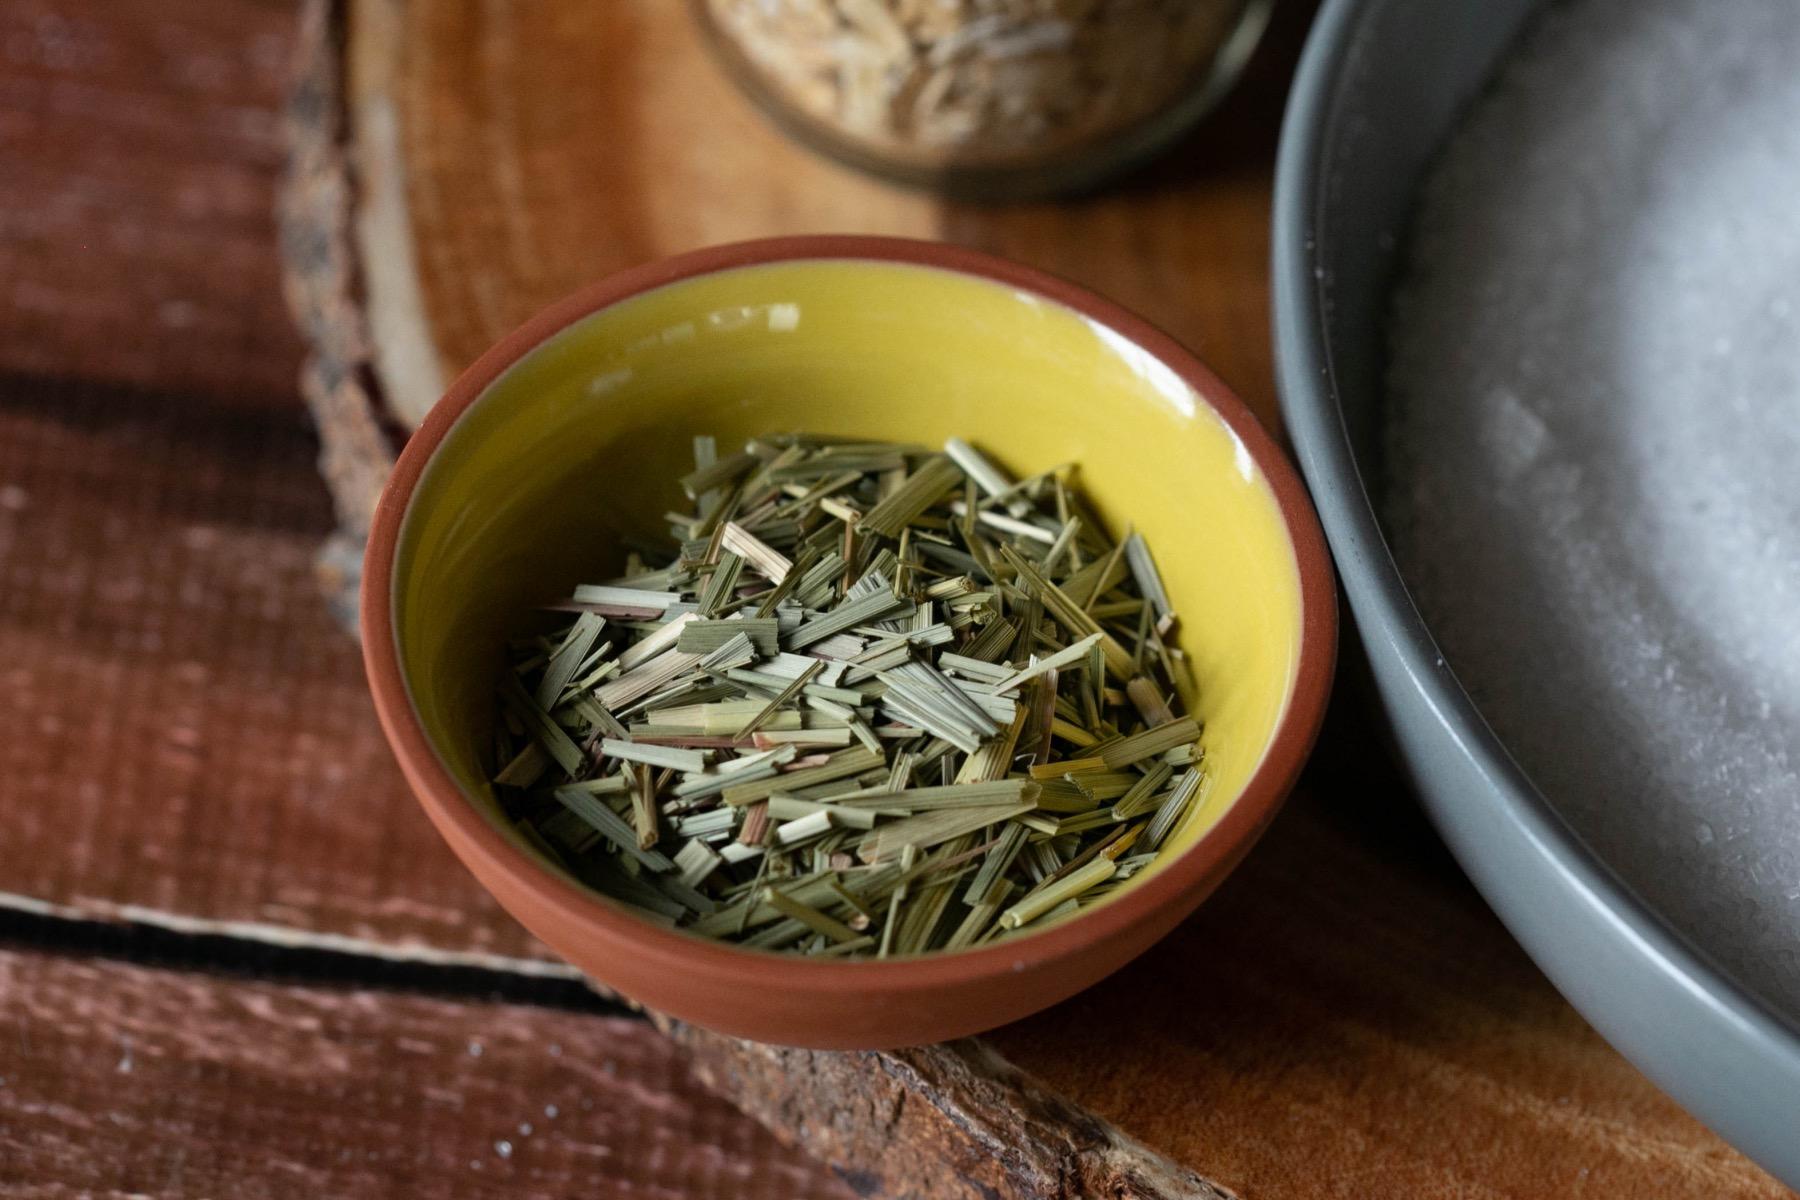 lemongrass ingredients for herbal bath soak